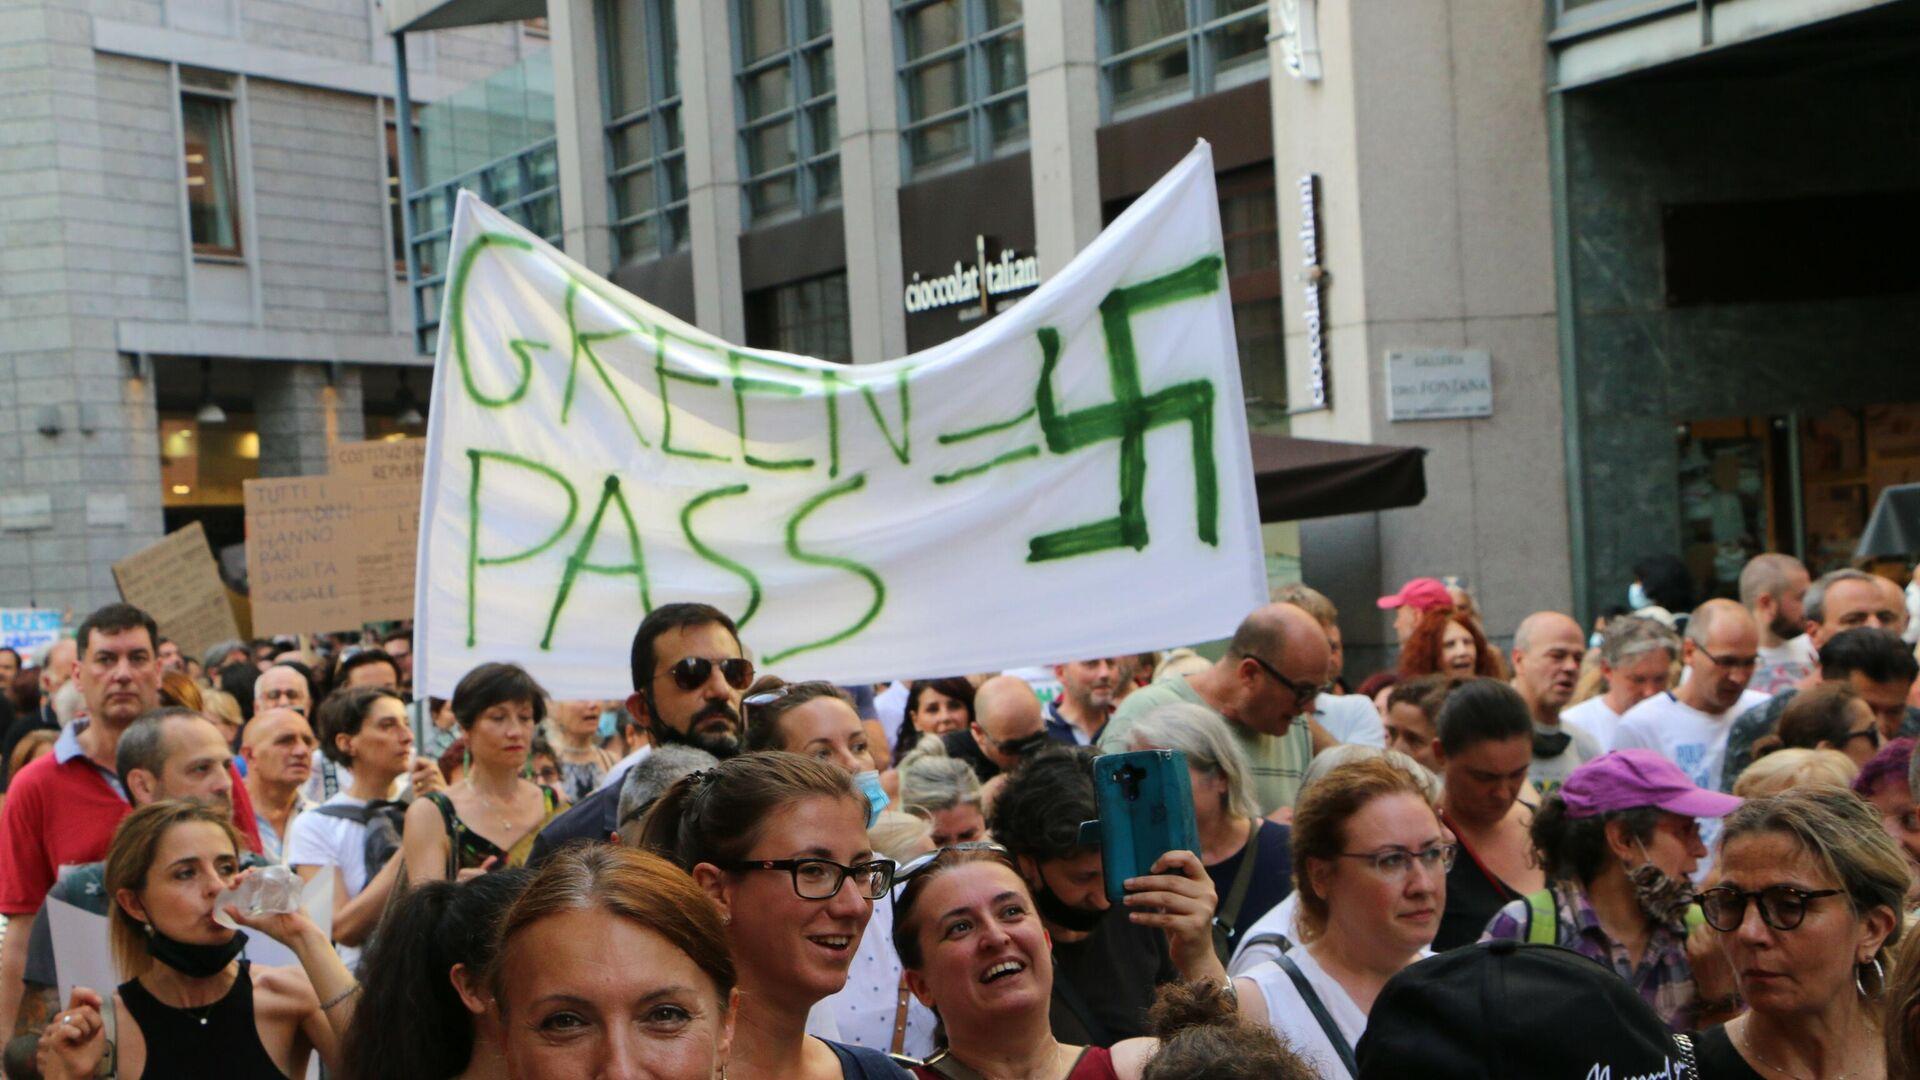 Manifestazione No green pass a Milano - Sputnik Italia, 1920, 25.08.2021